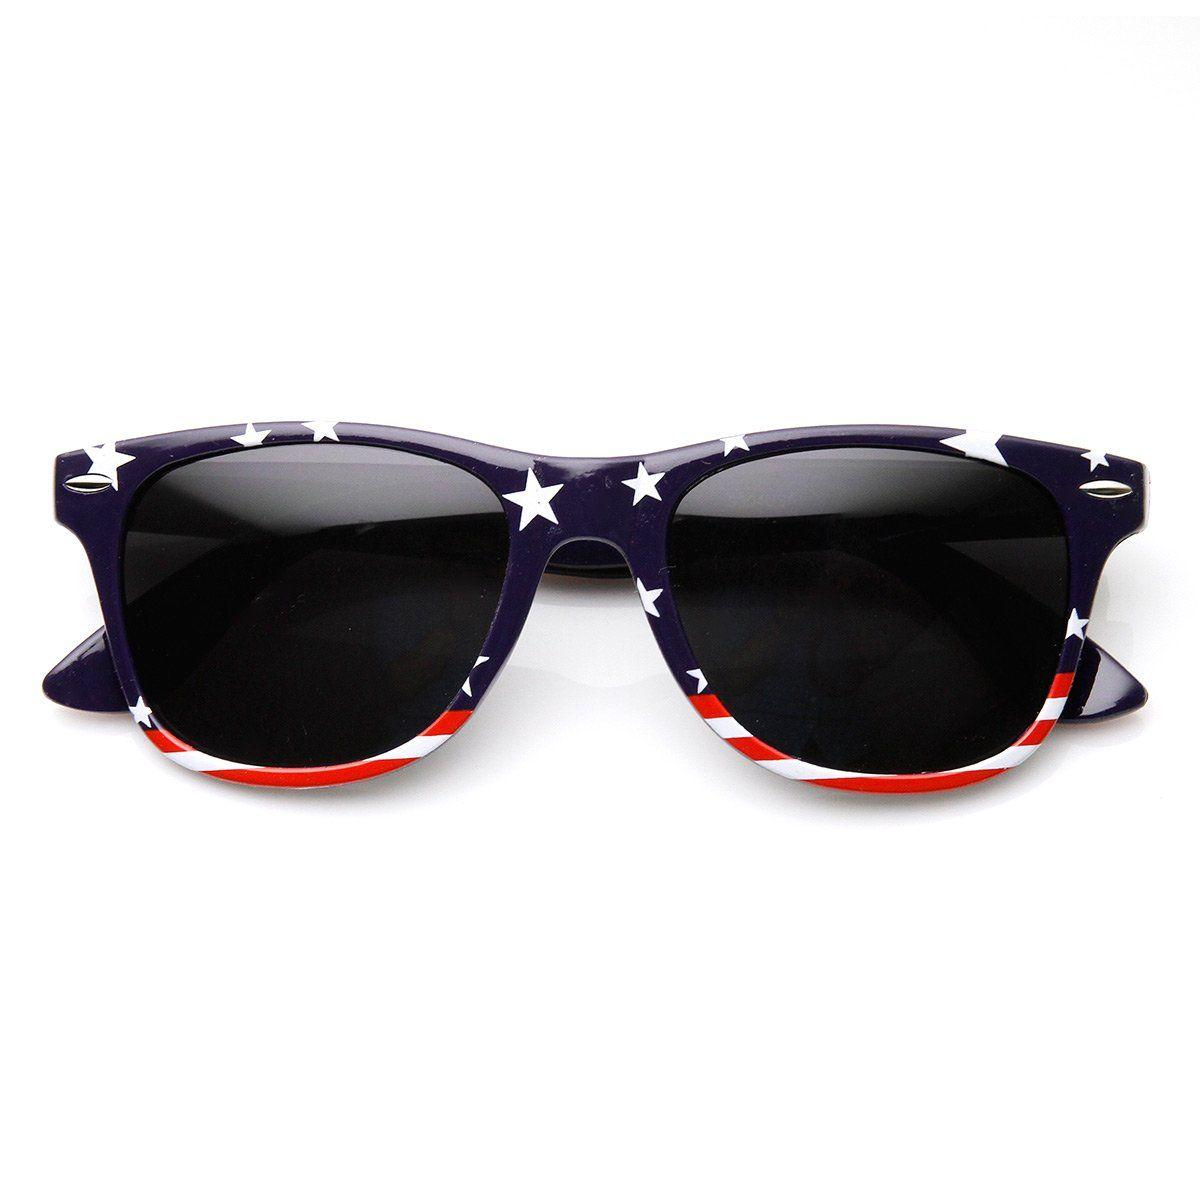 9383cc5af0d U.S. American Flag USA Stars and Stripes Horn Rimmed Sunglasses ...